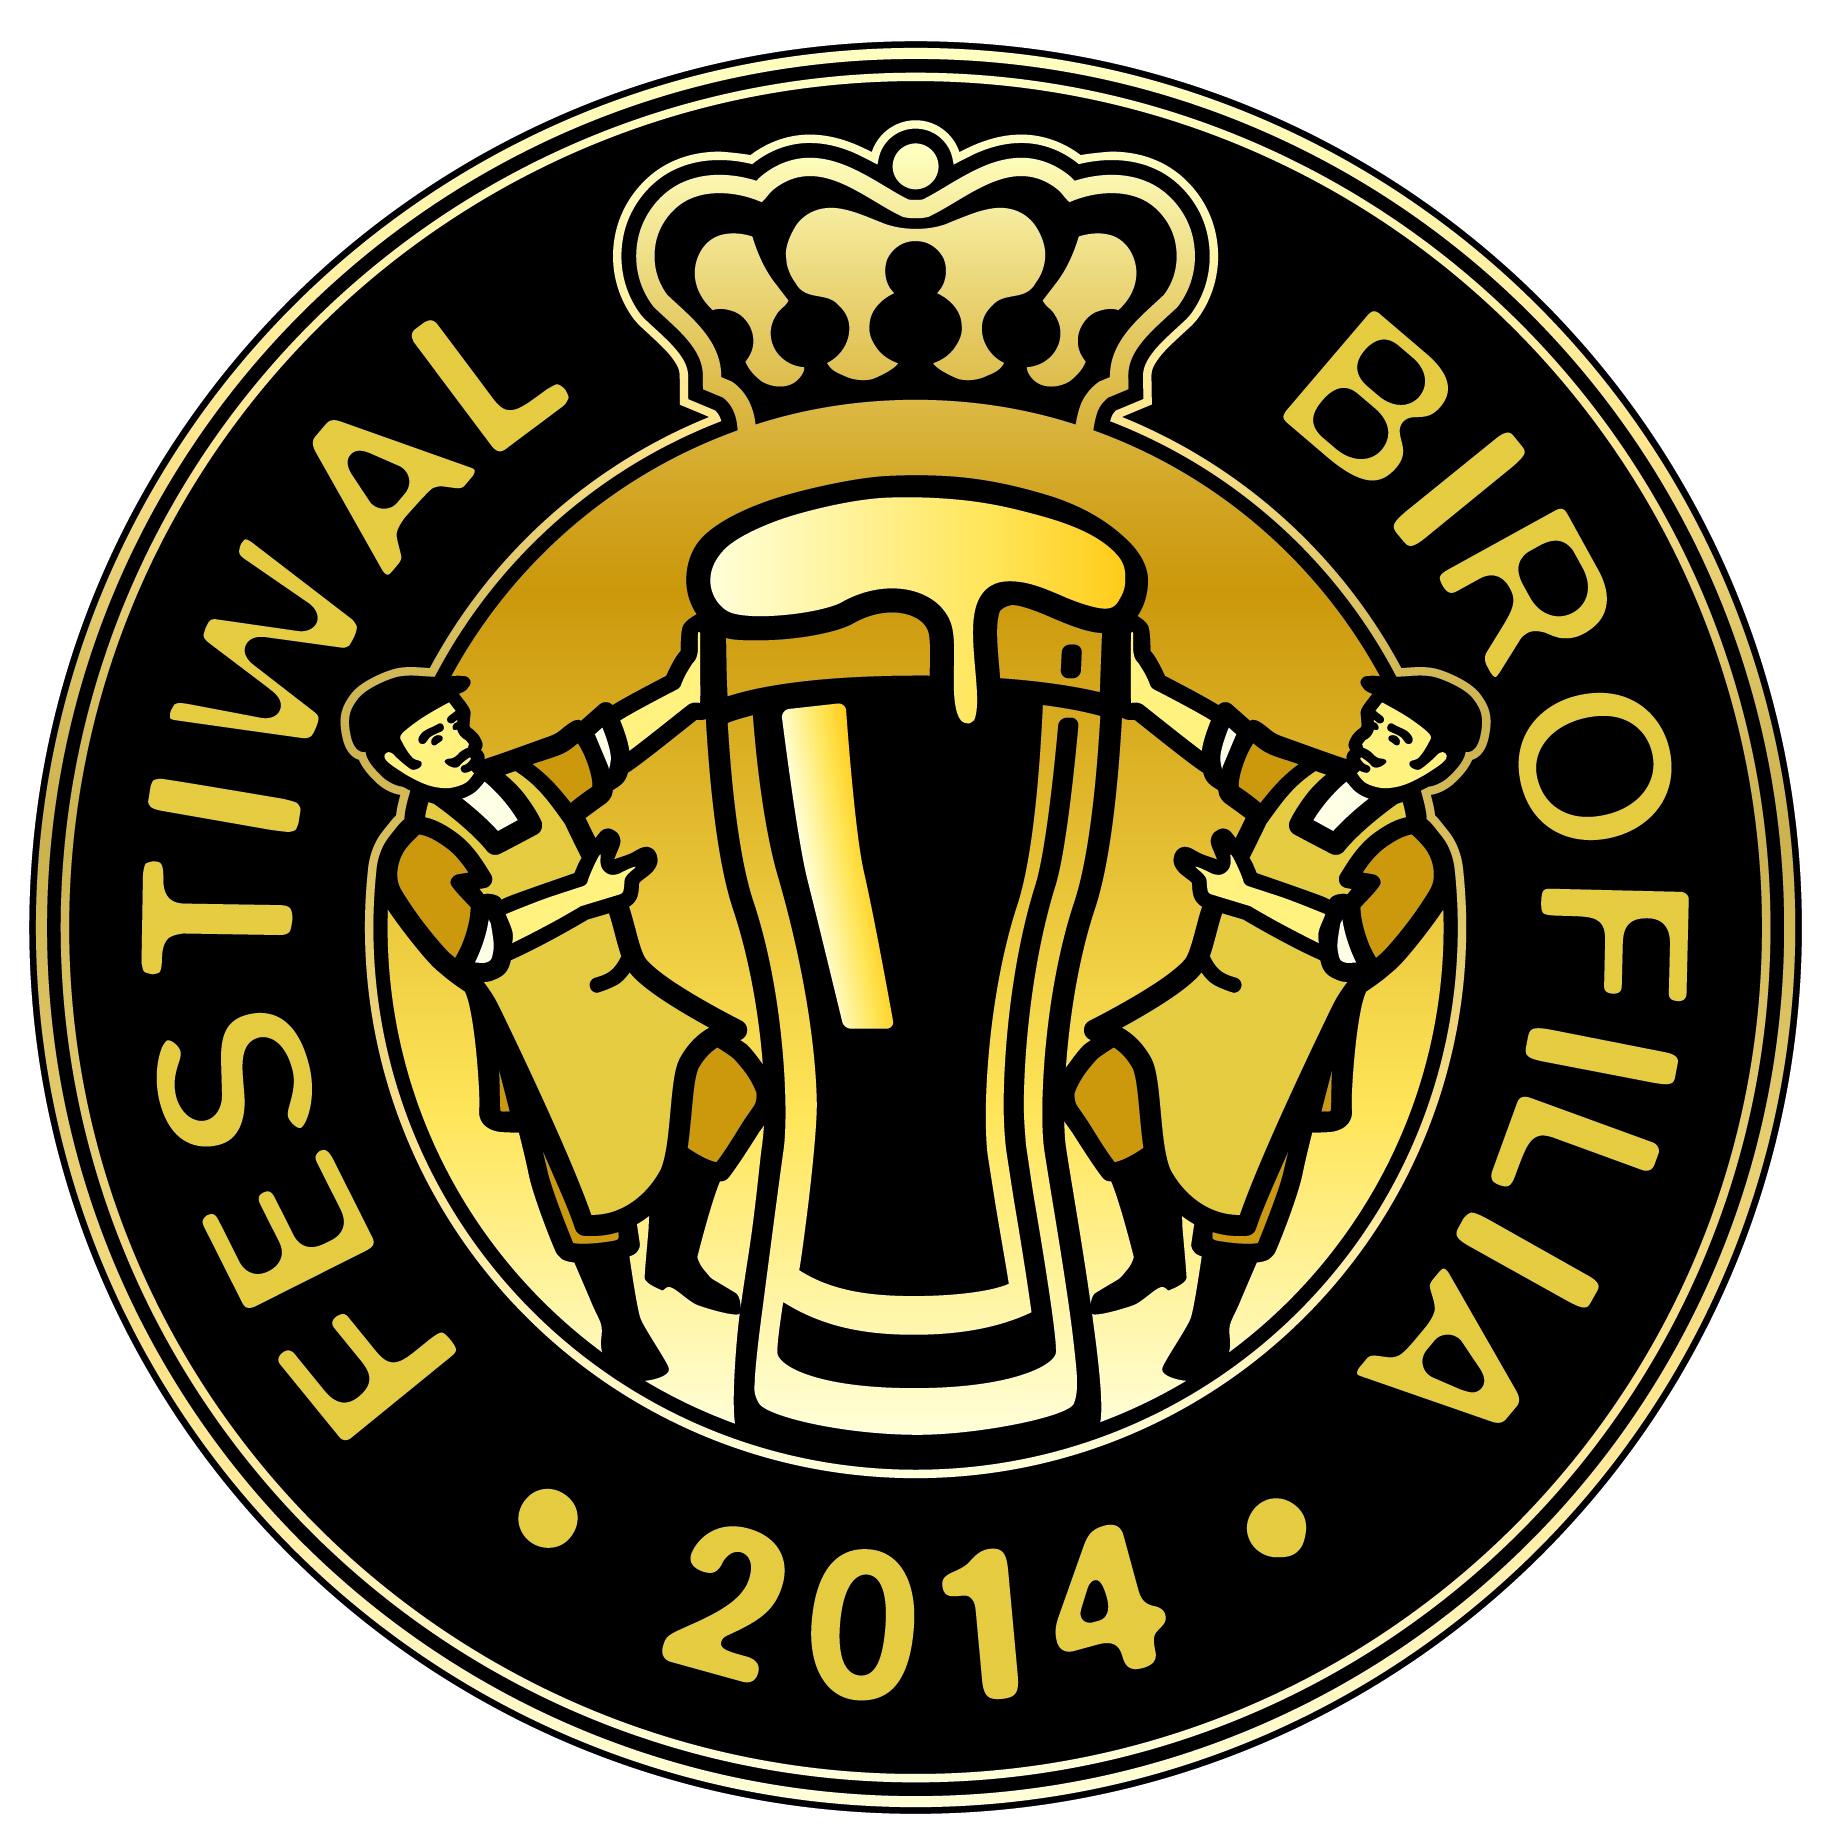 logo-festiwal-birofilia-2014